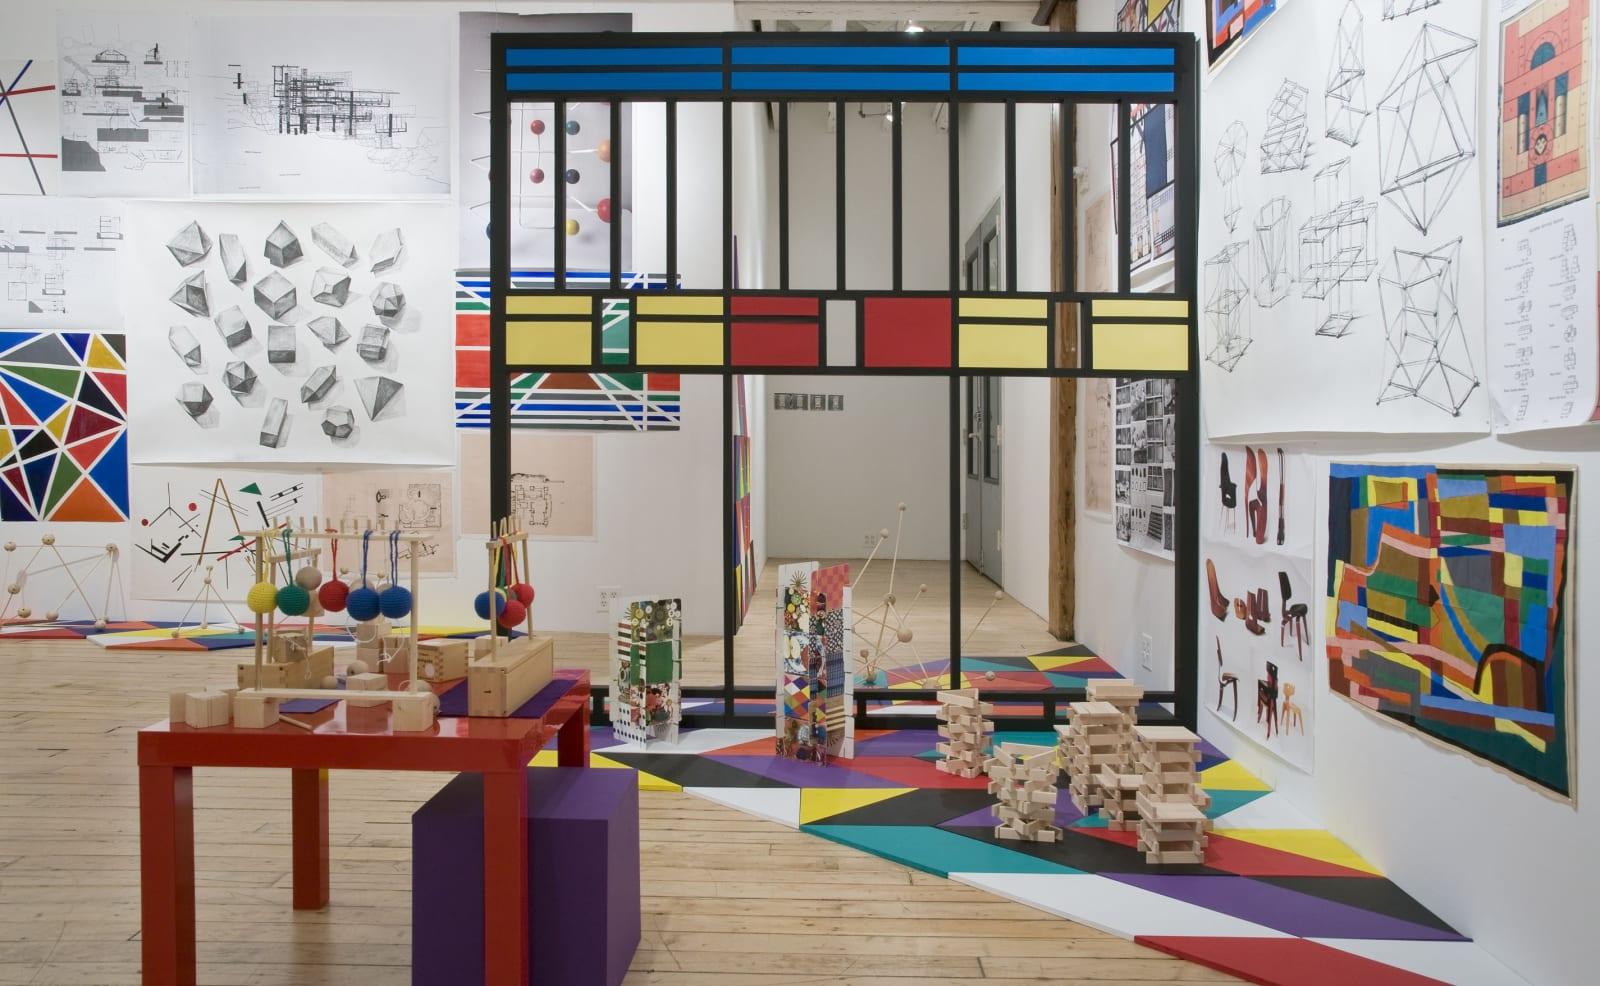 Fröbel Studio: The Institute for Creativity, RARE Gallery, New York, 2013